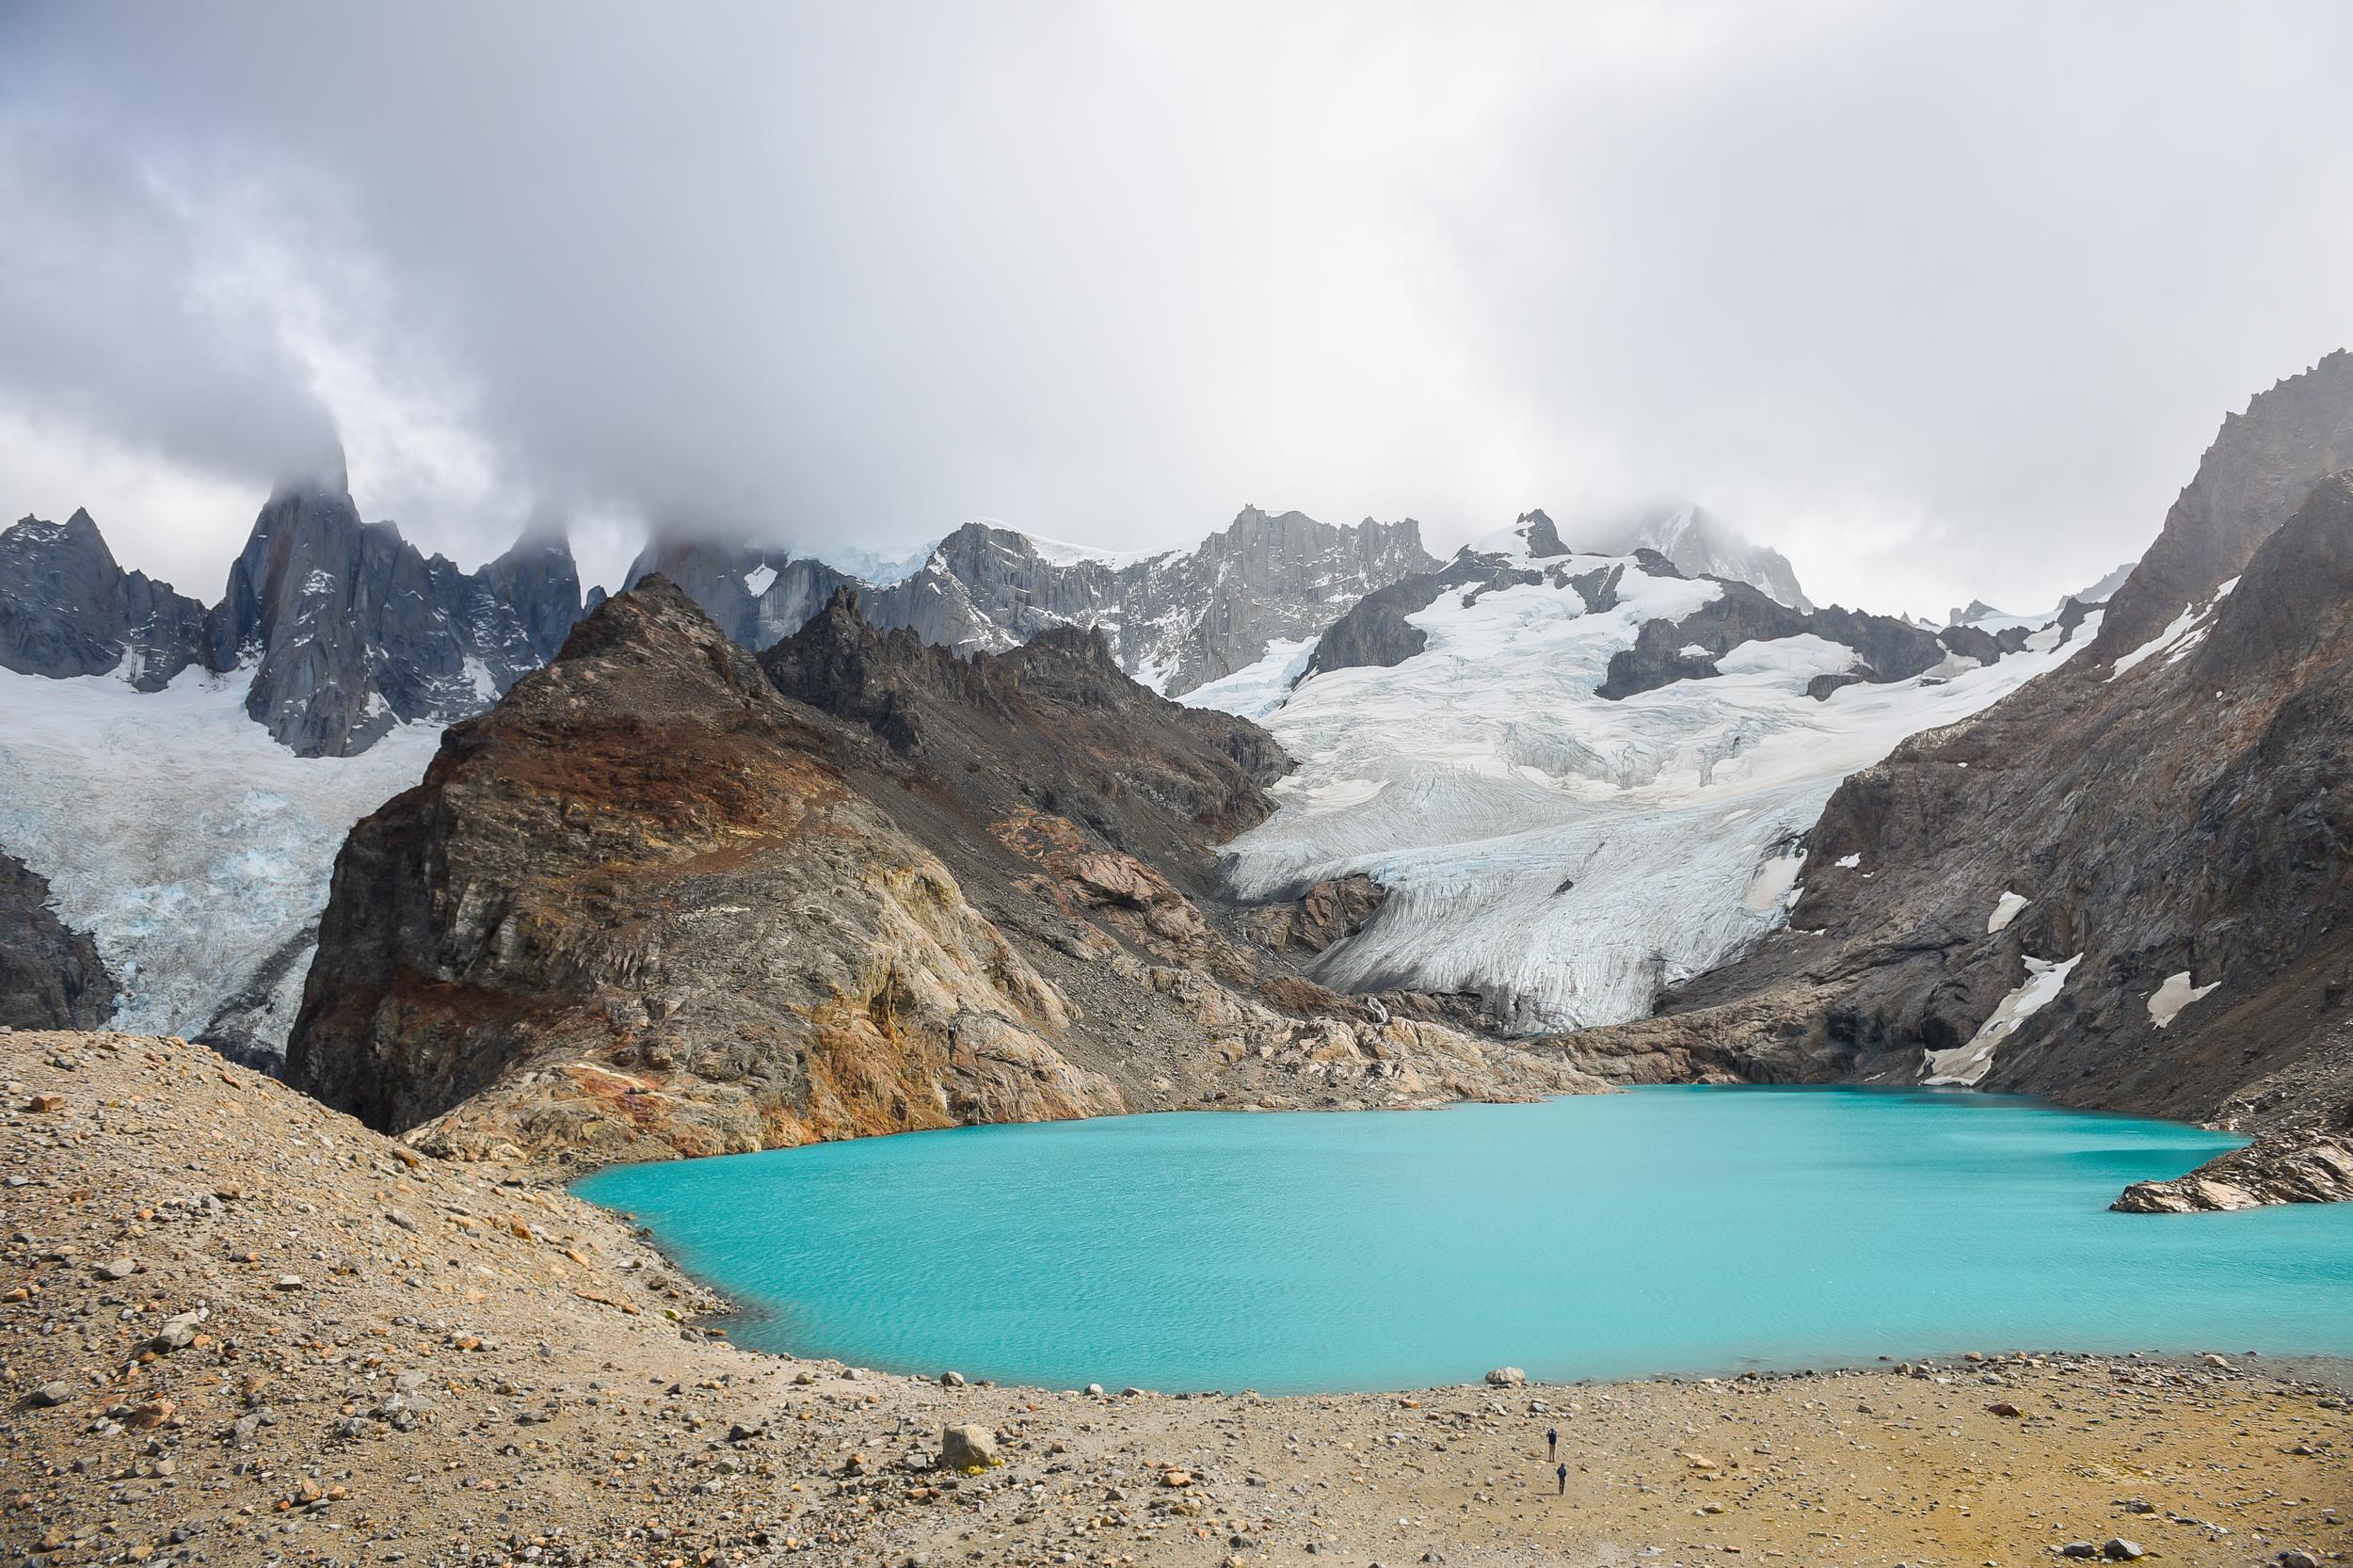 patagonia-13_26633385366_o.jpg